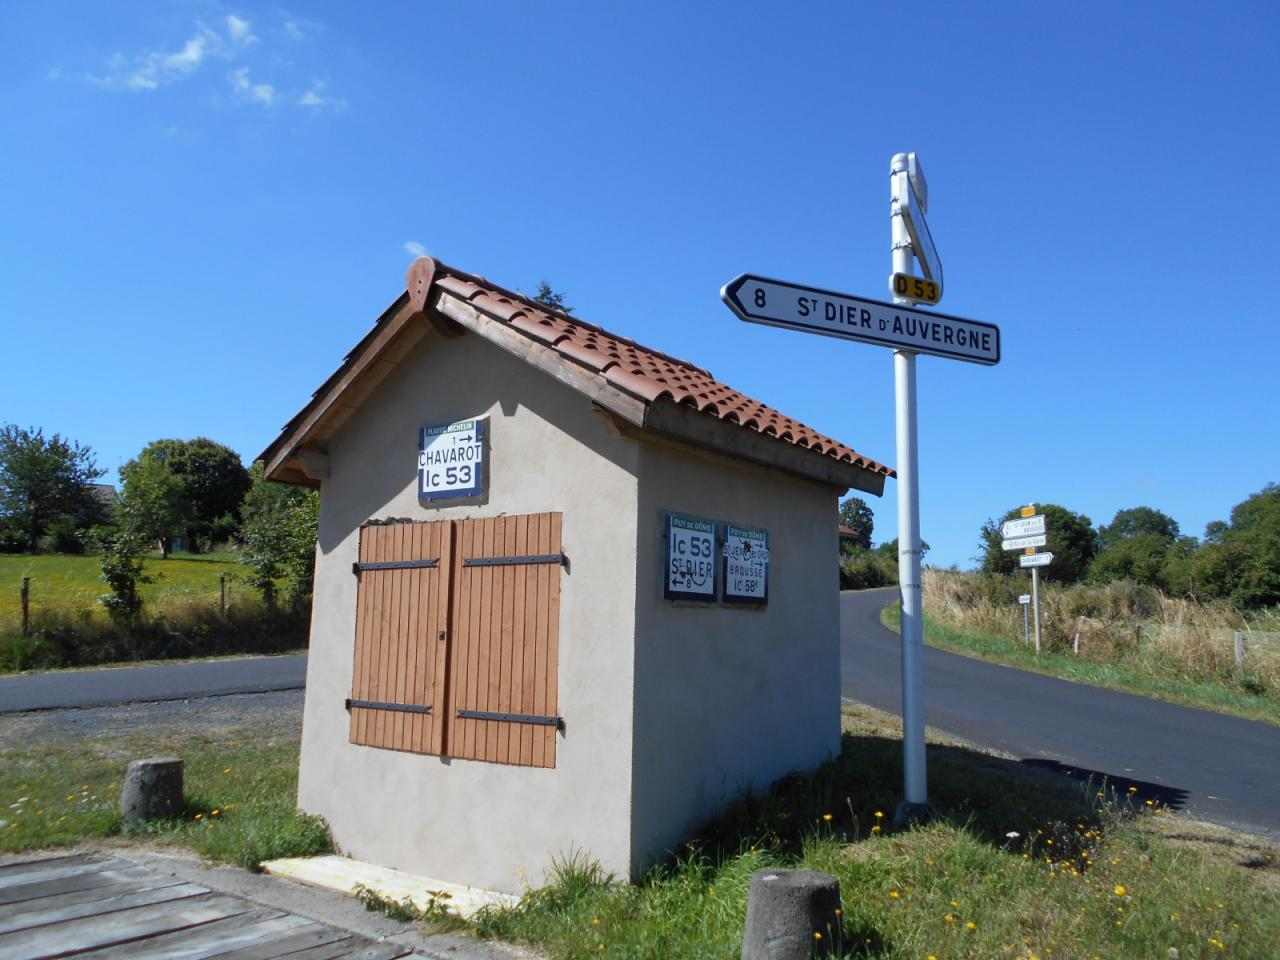 63520 Chavarot (2)